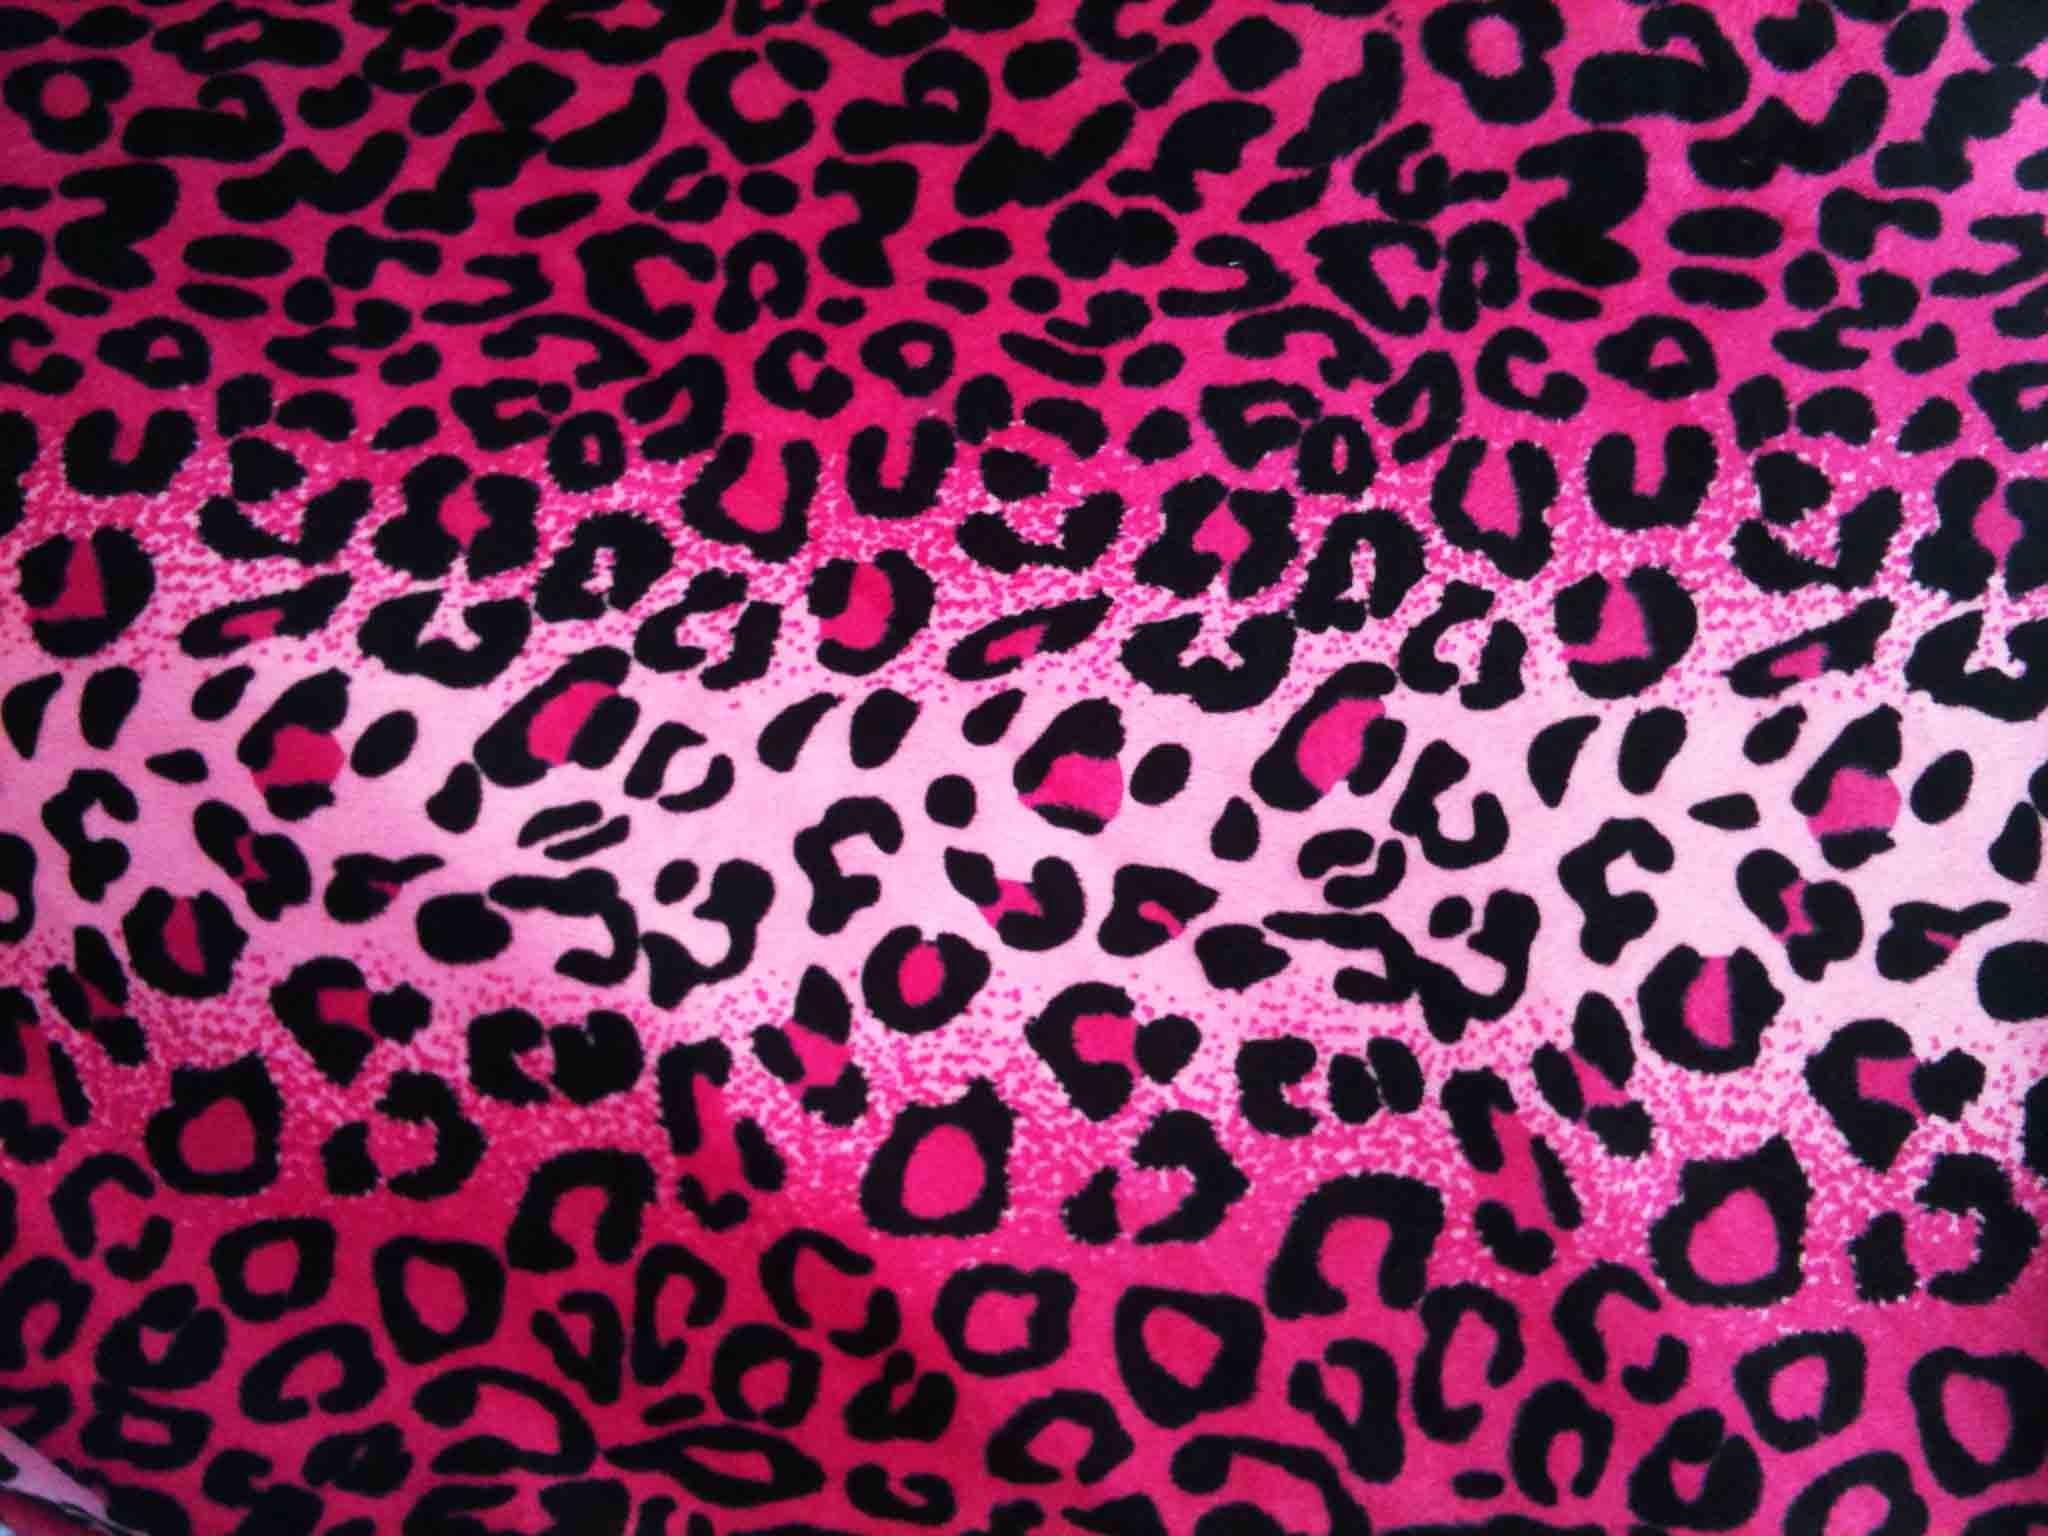 668b9daaaba6 Cheetah Backgrounds wallpaper Pink Cheetah Backgrounds hd wallpaper  2048x1536